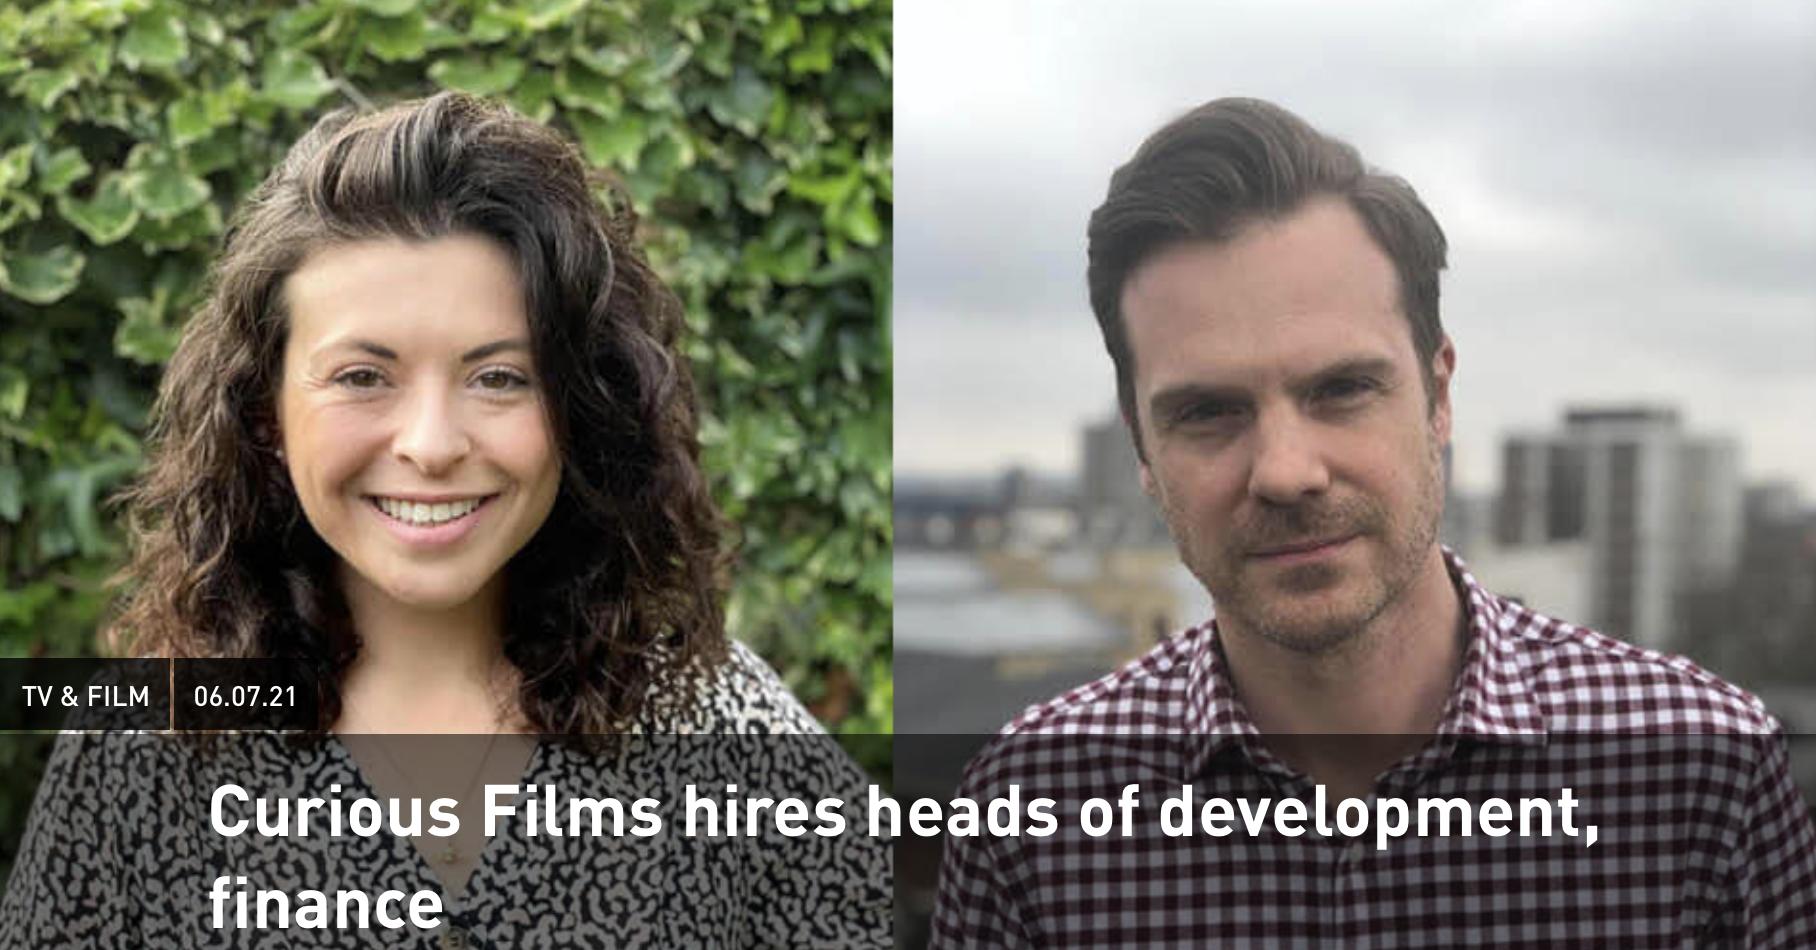 Curious Films hires Becky Kent and Mark Raeburn